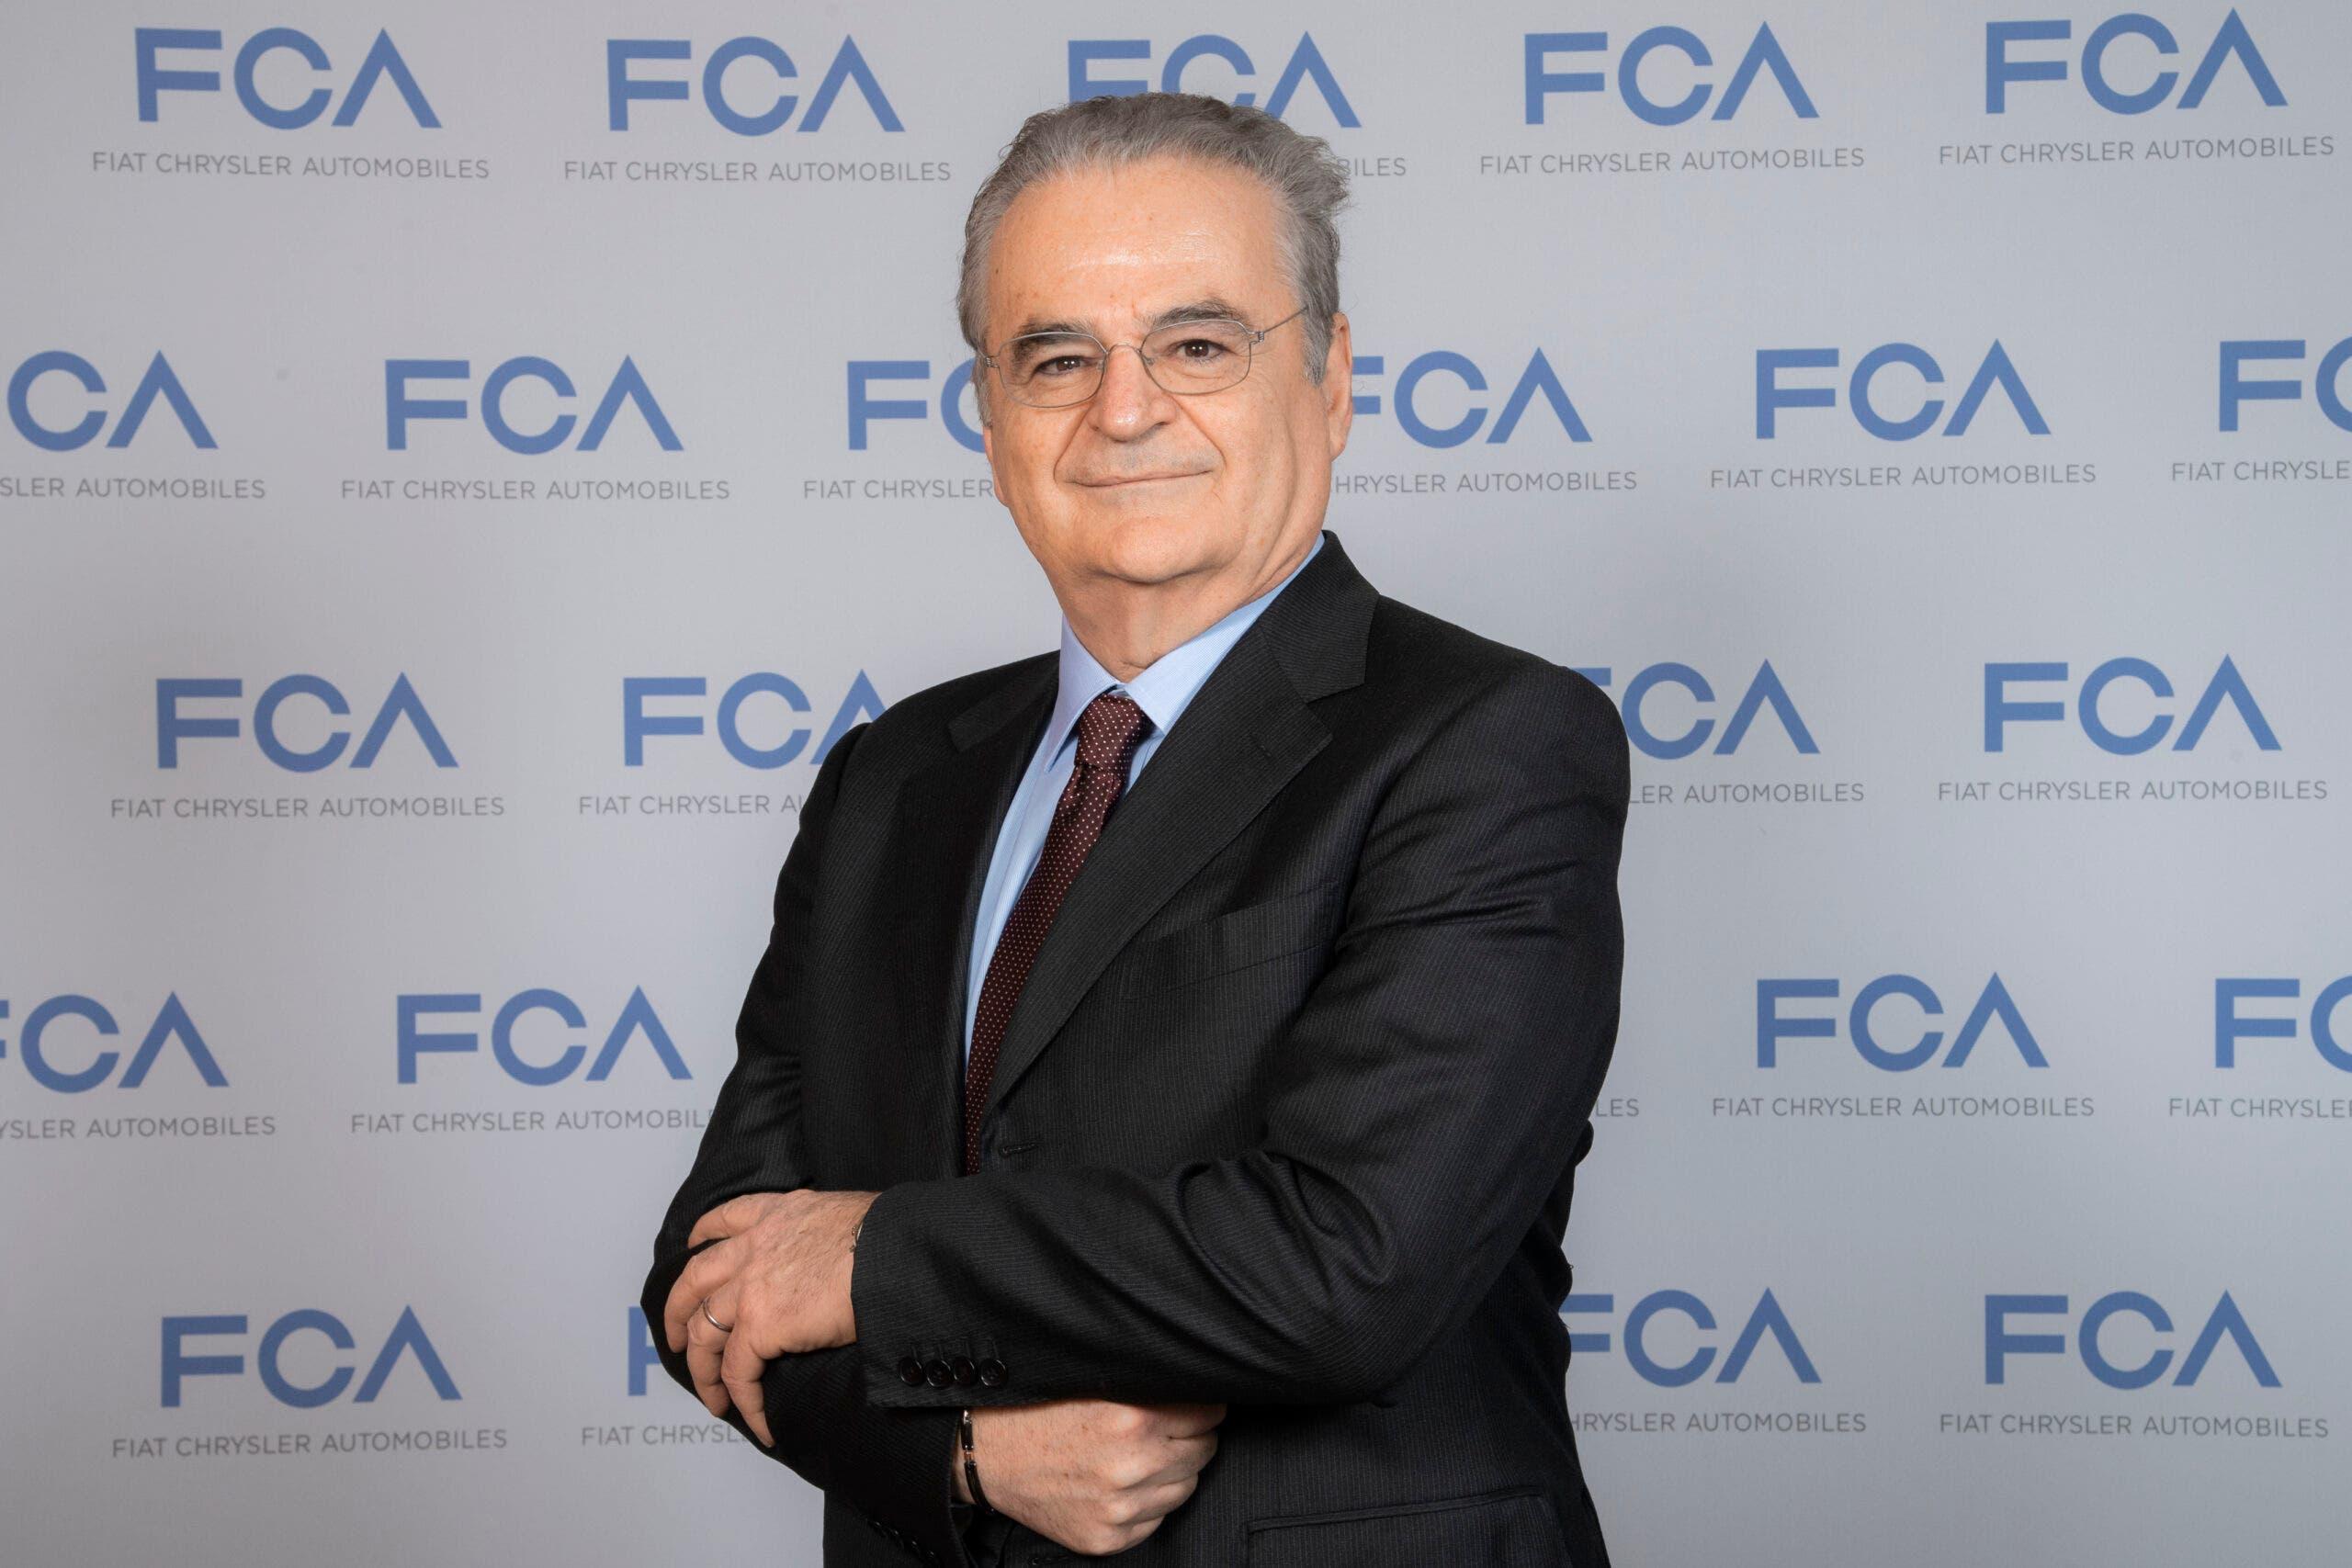 Luigi Galante FCA